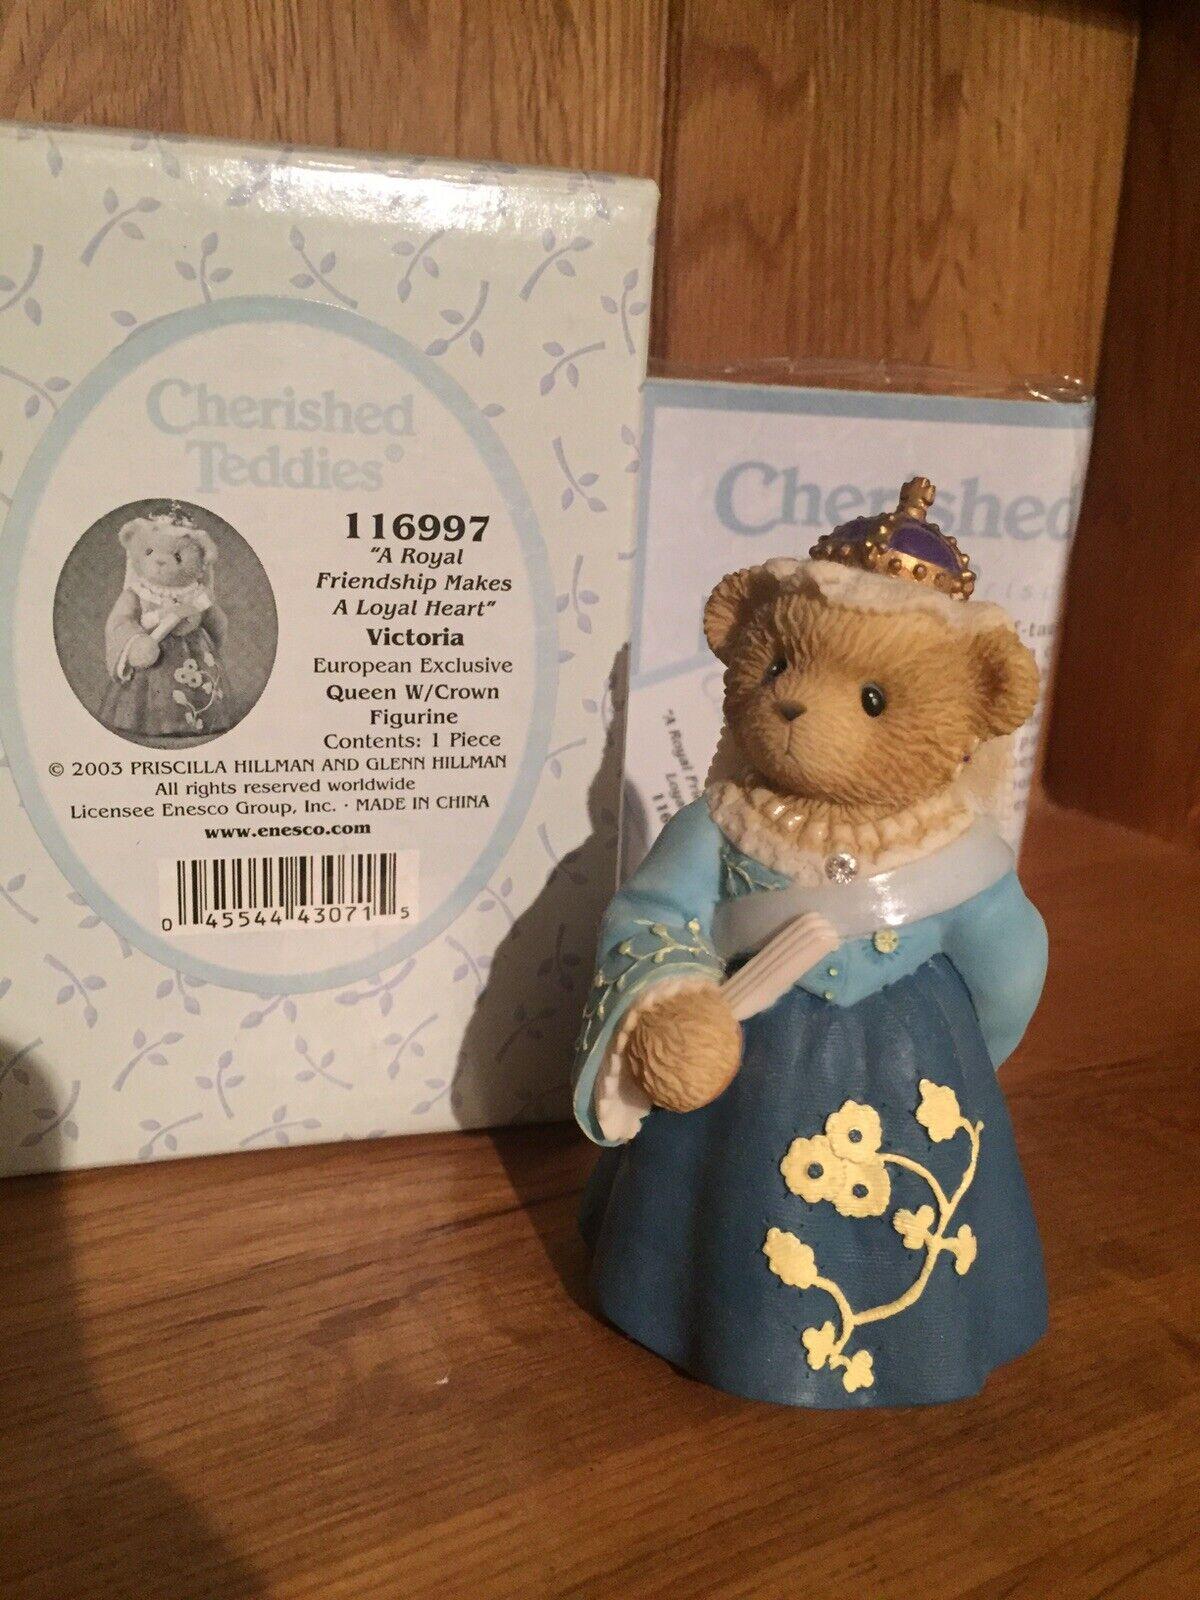 Cherished Teddies Queen Victoria European Exclusive